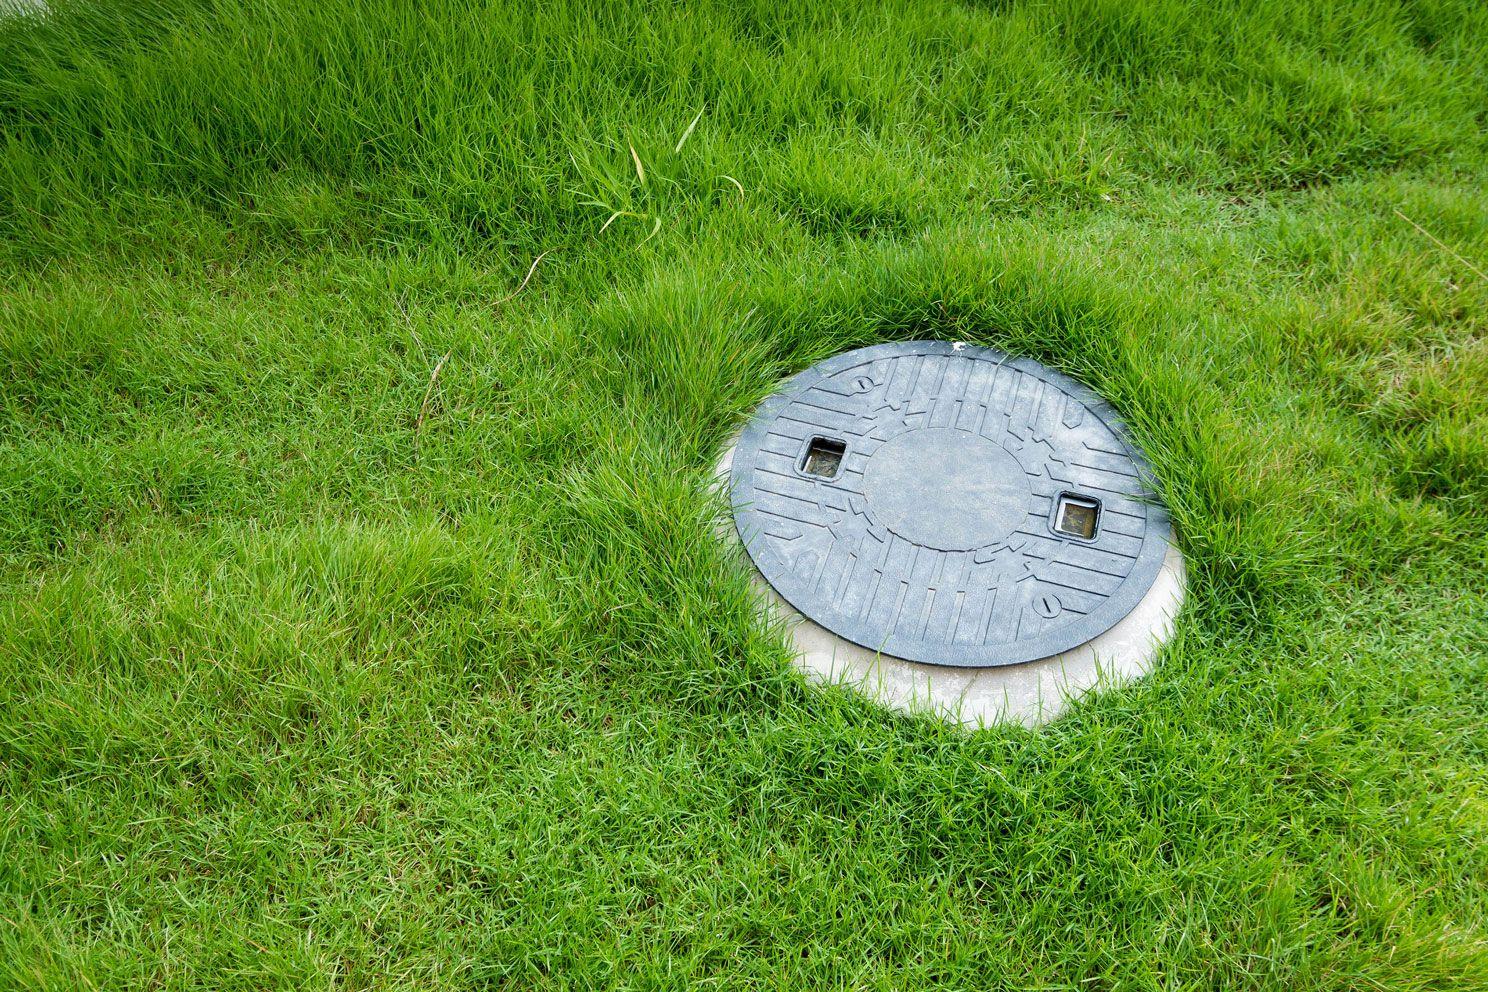 basic vastu for home-septic tank-grass-greenery